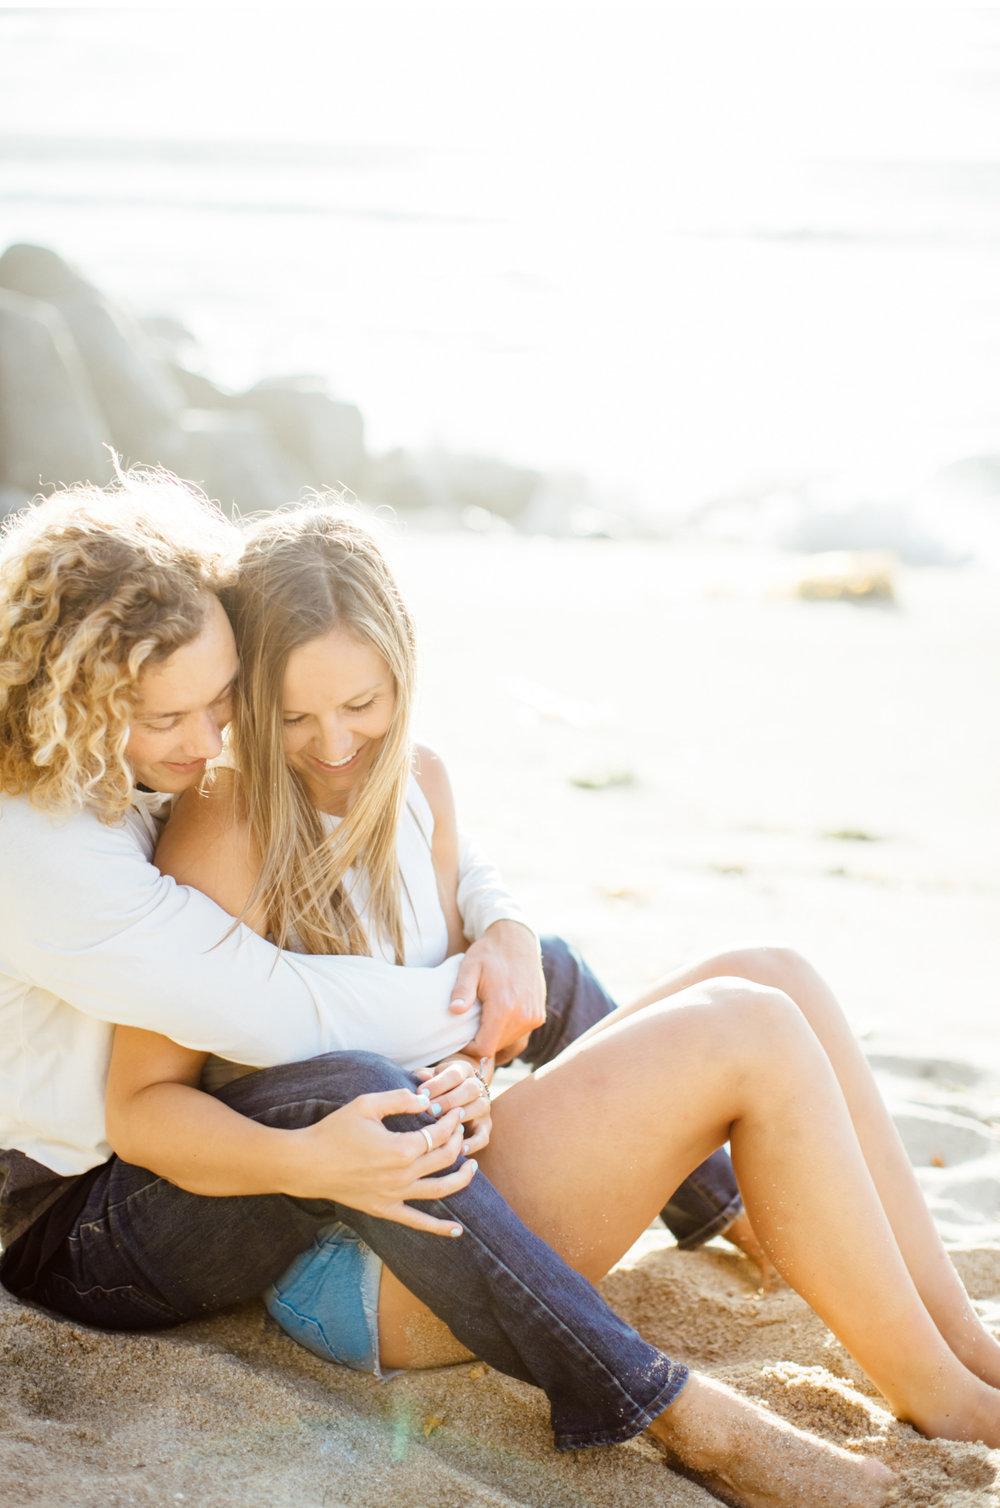 Natalie-Schutt-Photography-California-Surf-Style-Me-Pretty-Wedding_05.jpg